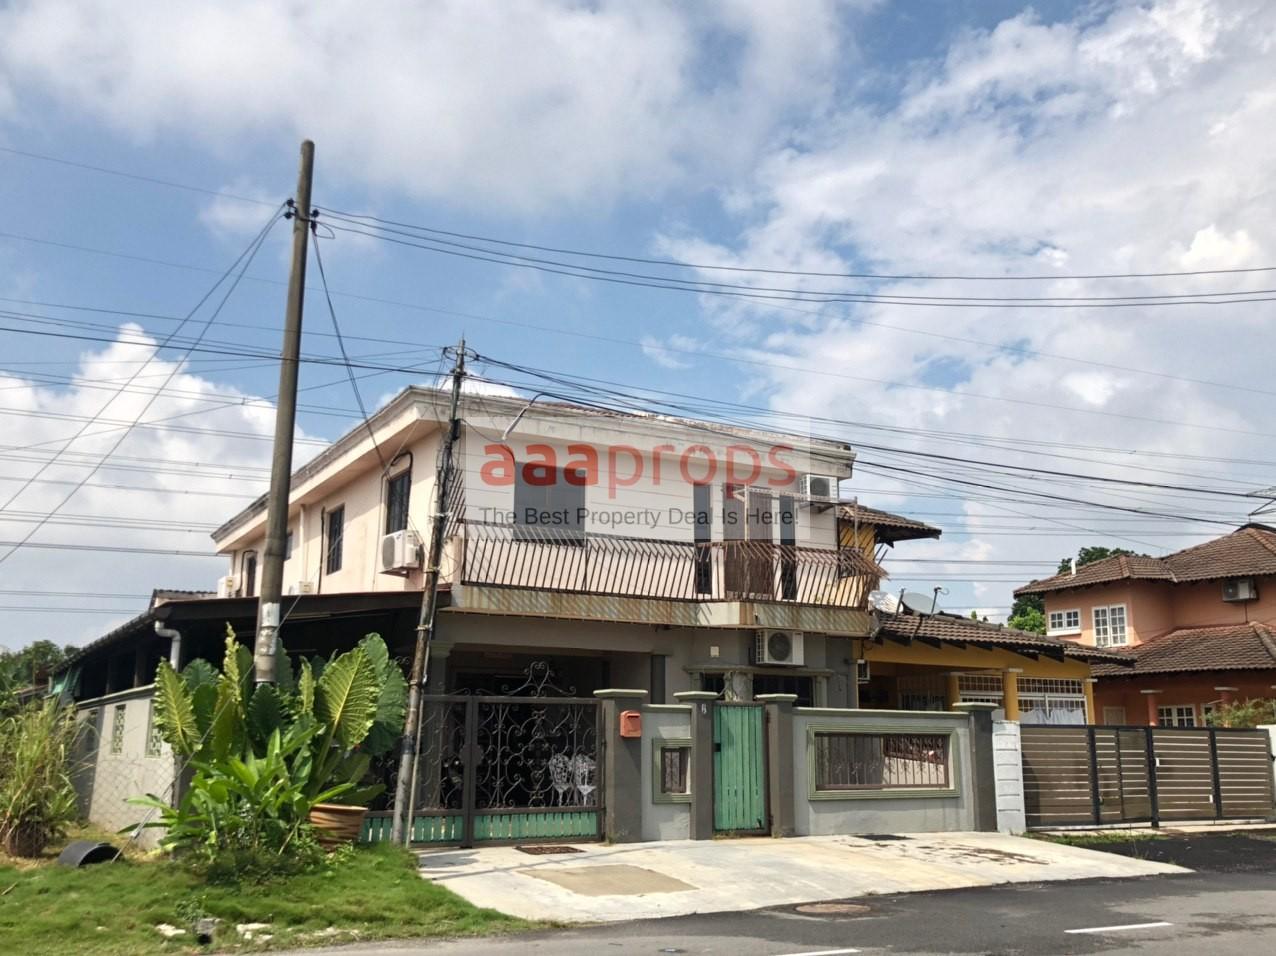 2 Storey SEMI-D Seksyen 8, Bandar Baru Bangi